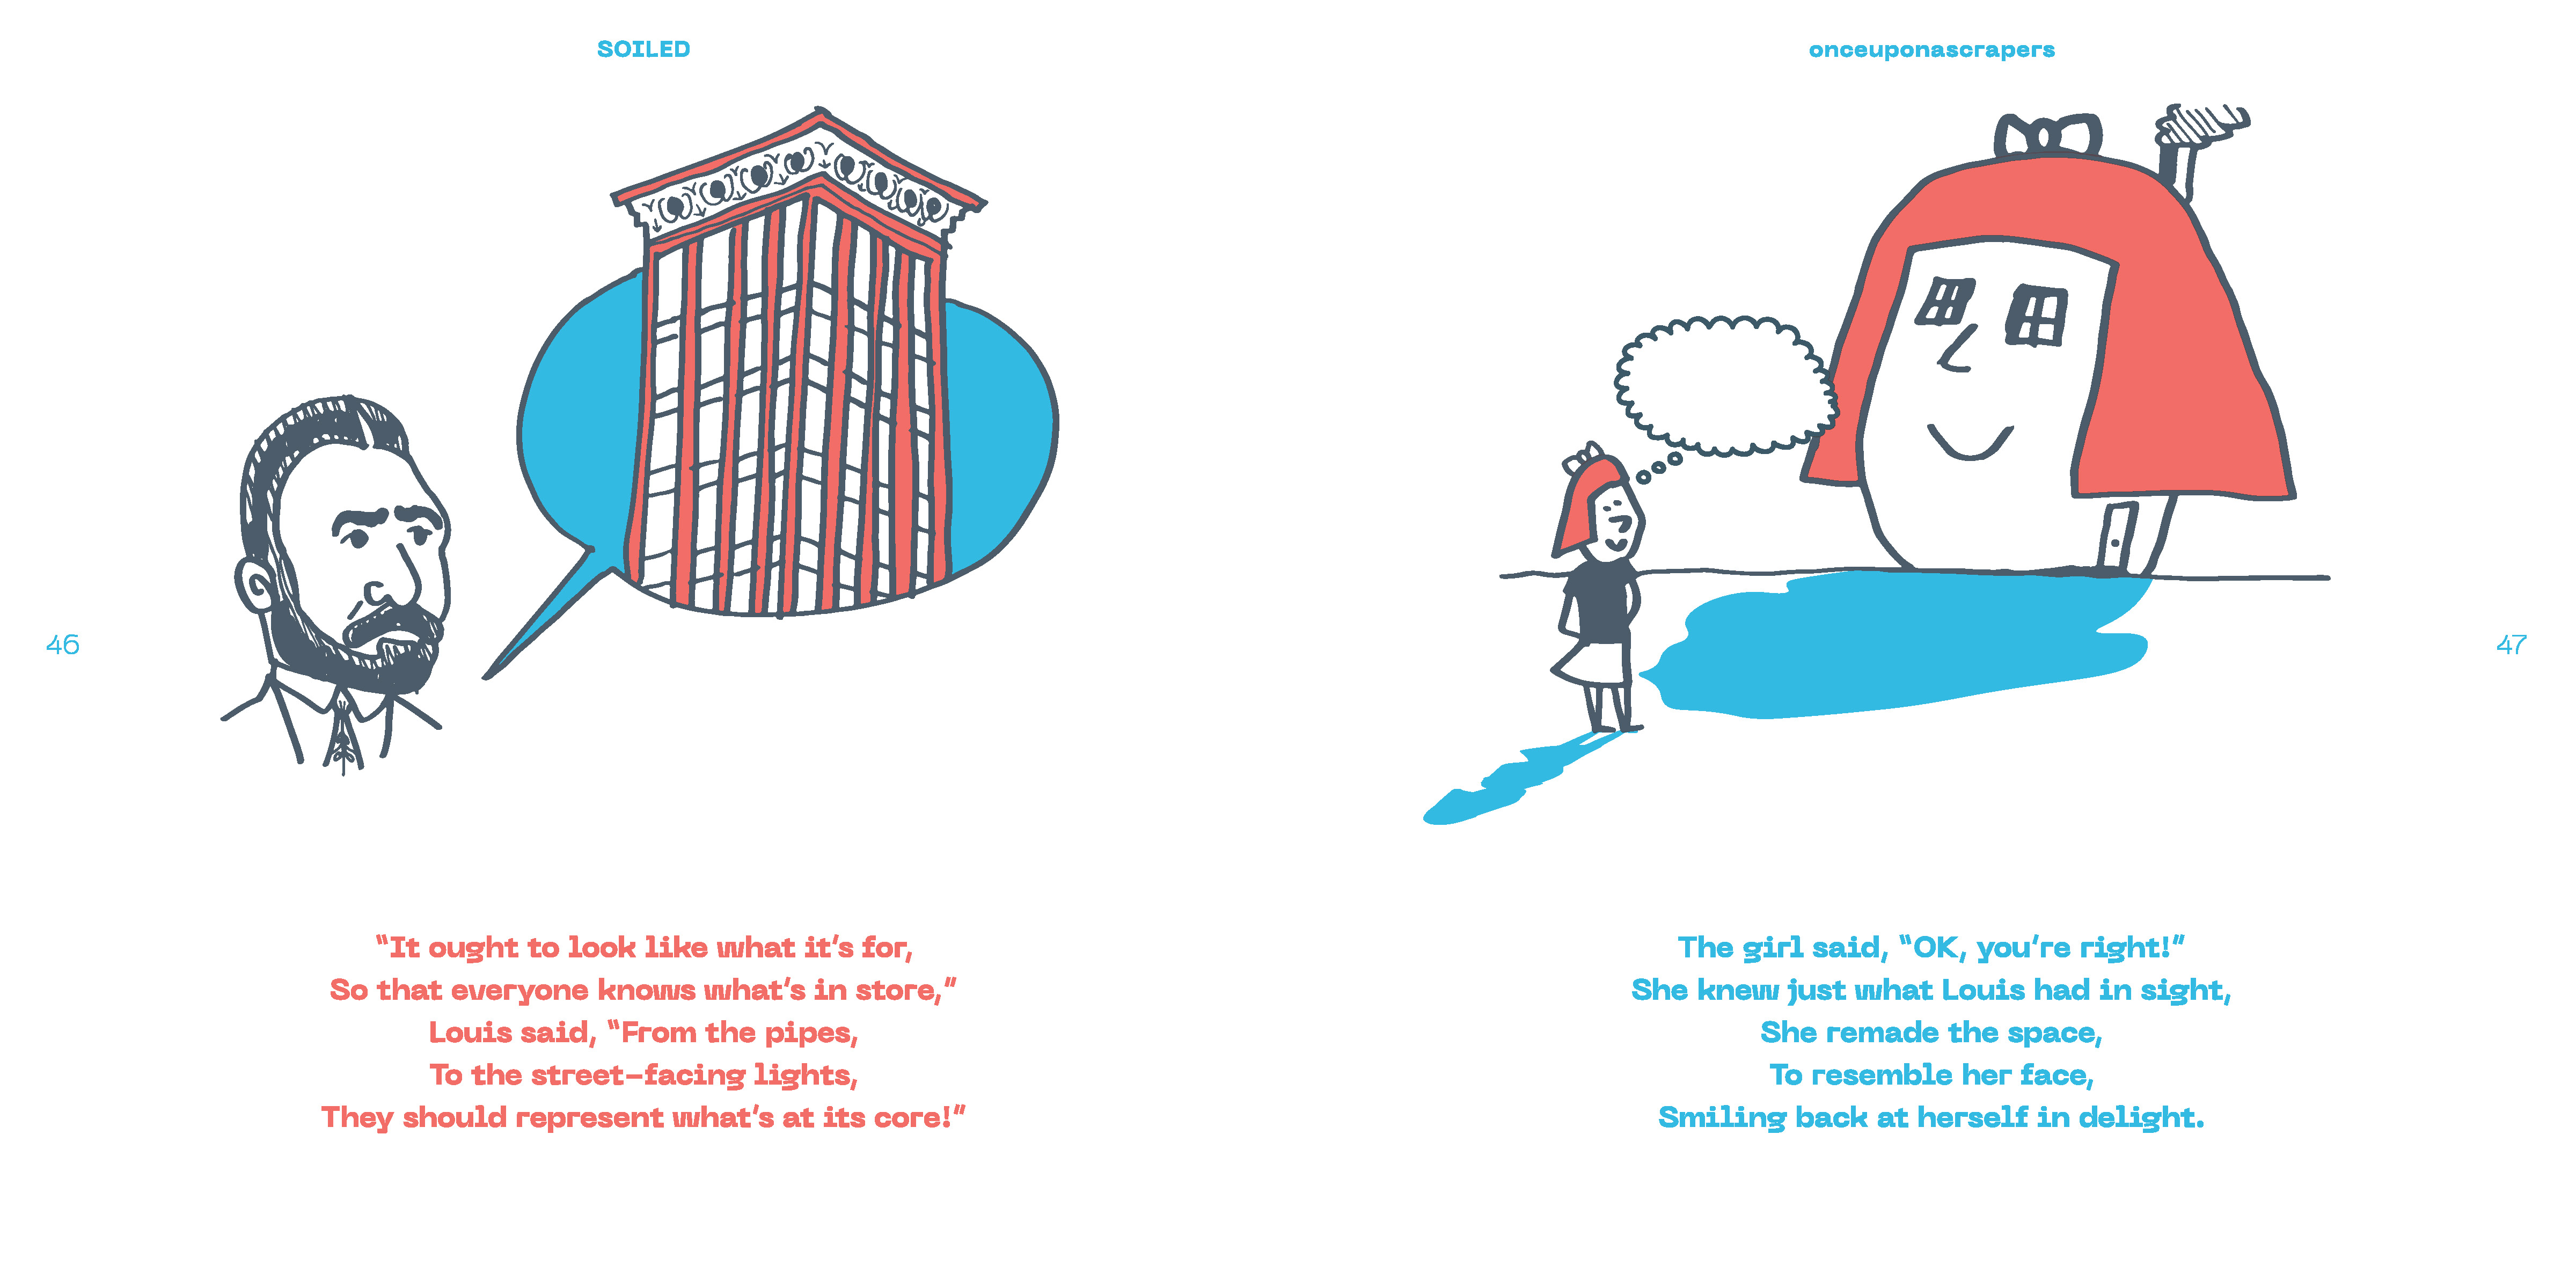 OK Architecture Axel Olson Milo Krimstein Soiled Zine childrens story